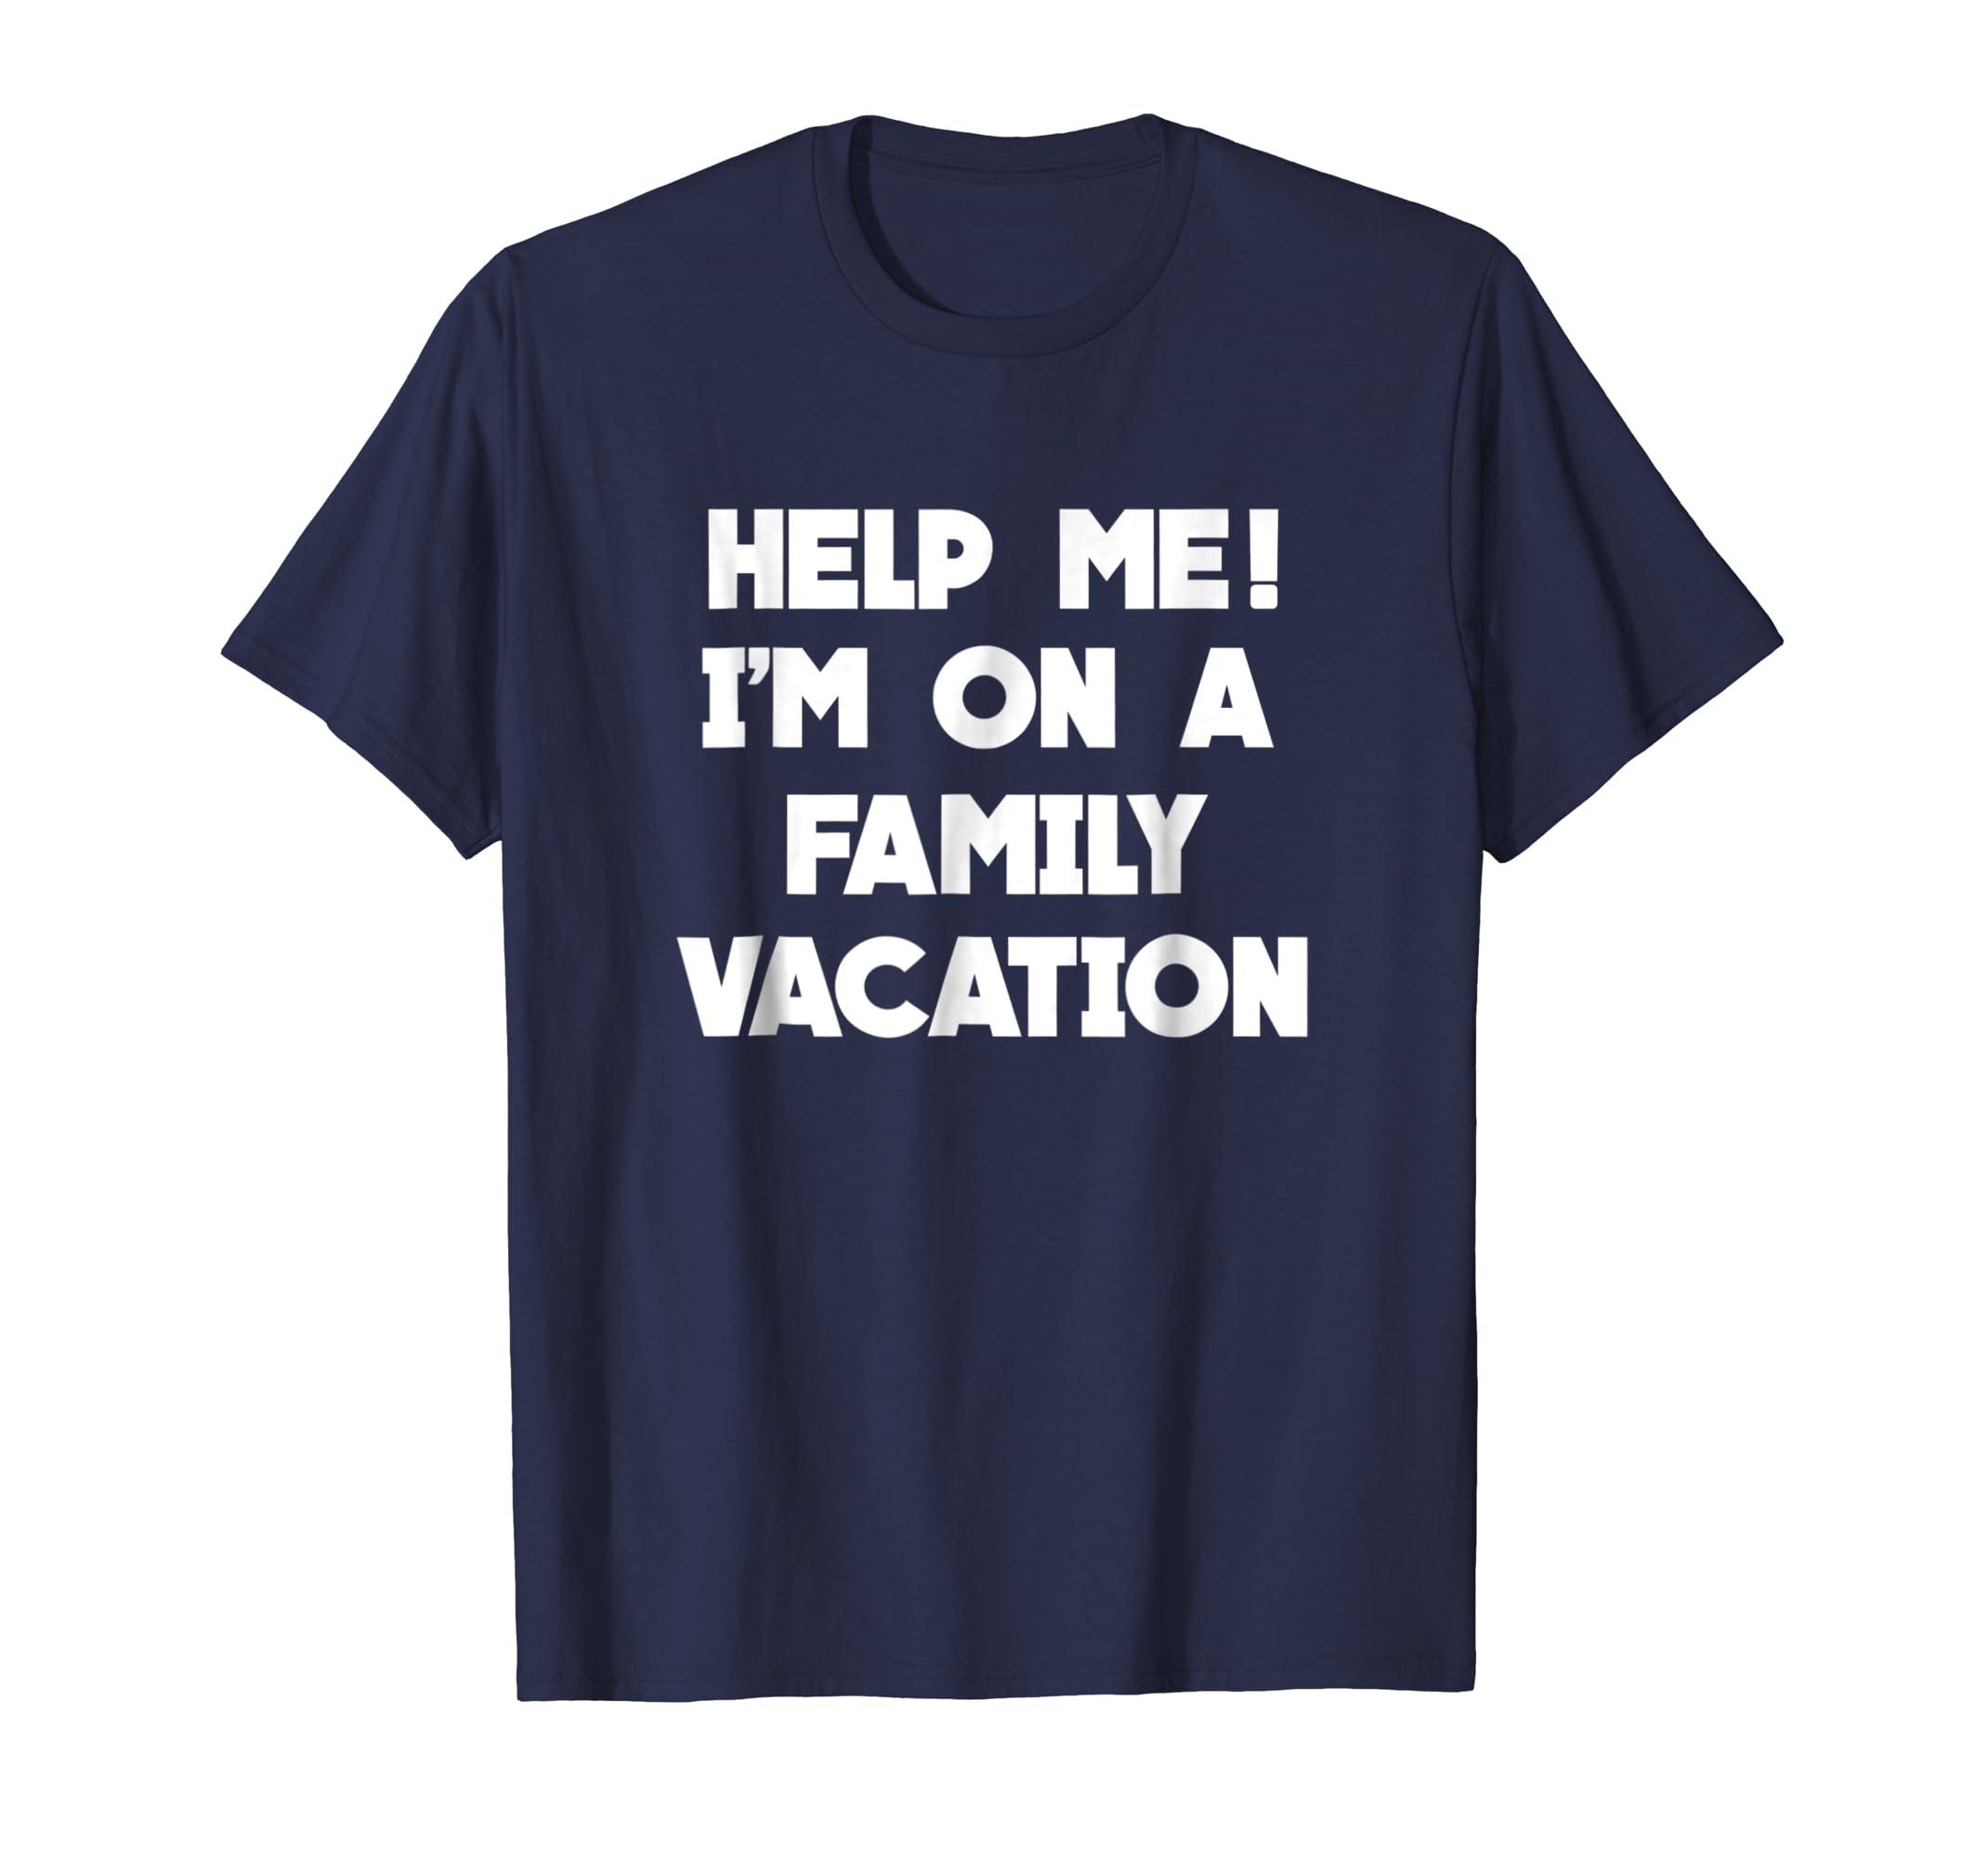 ae0839c8c Funny Family T Shirt Sayings - DREAMWORKS